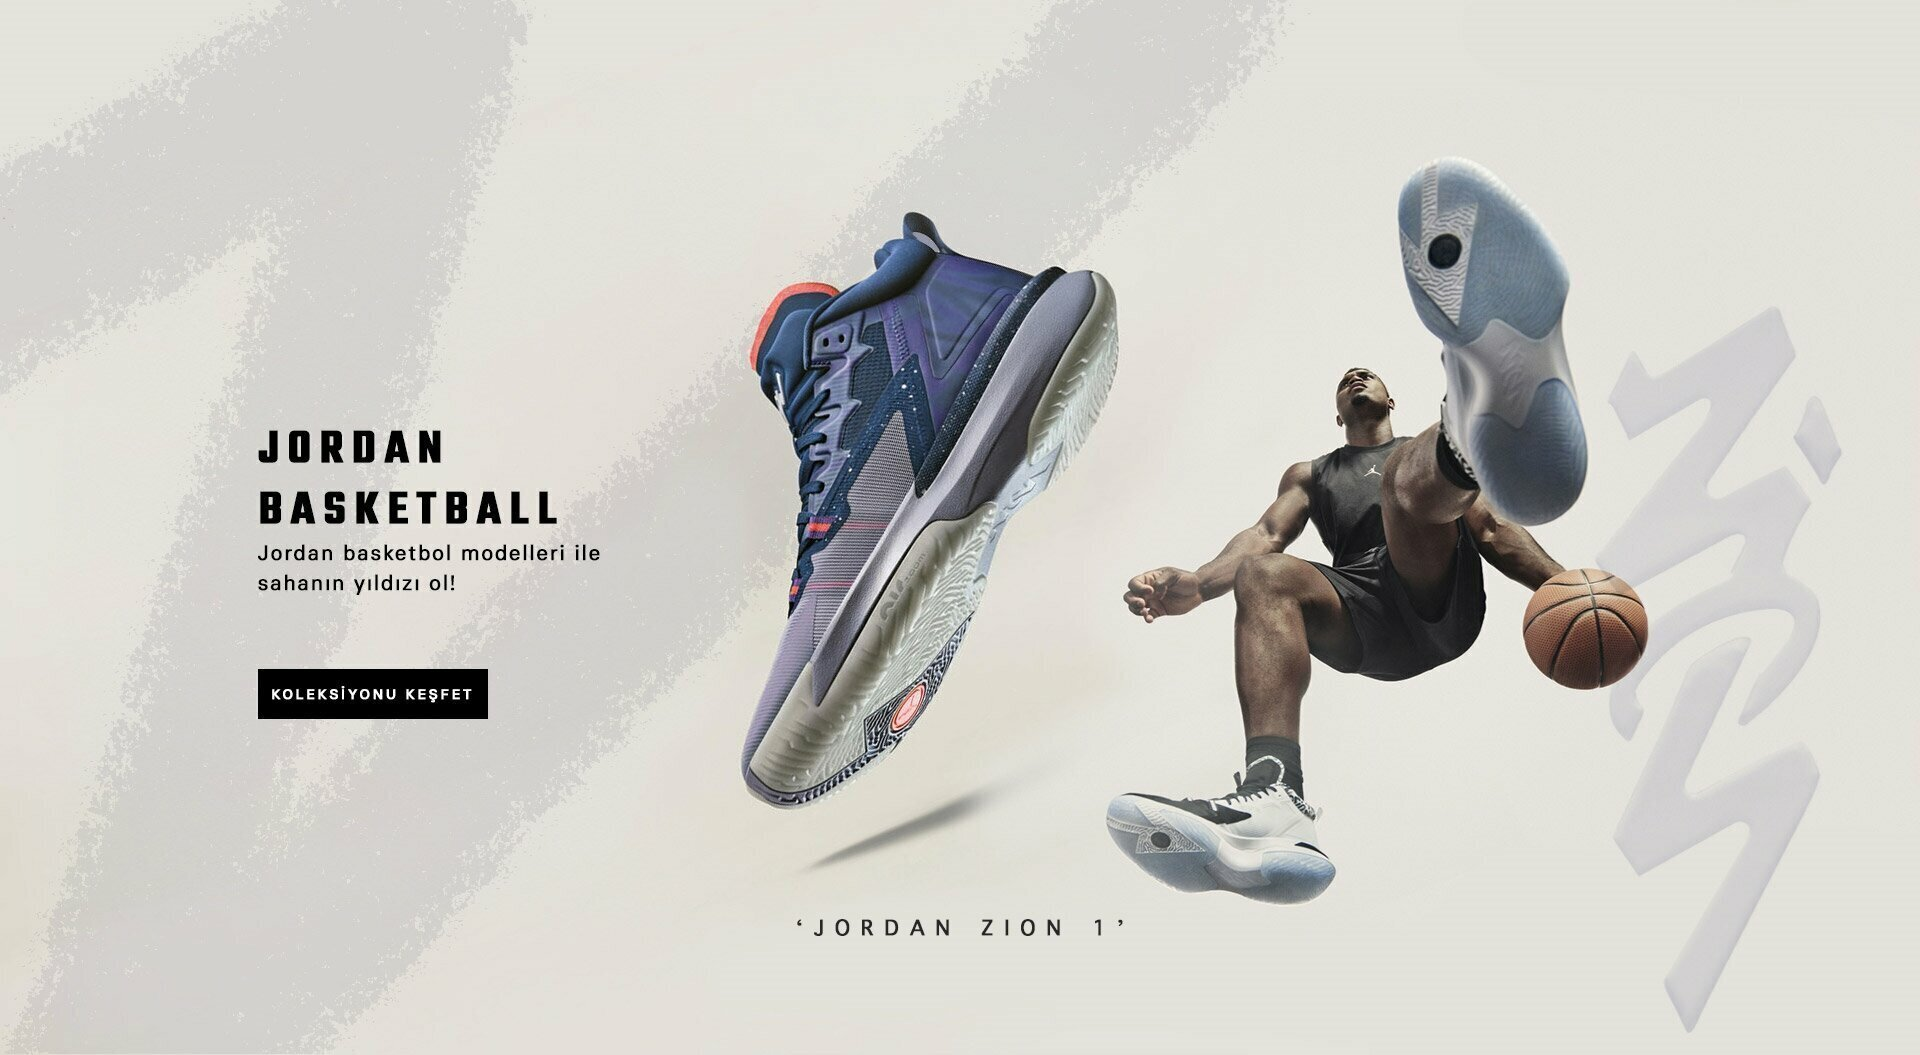 JordanBasketball